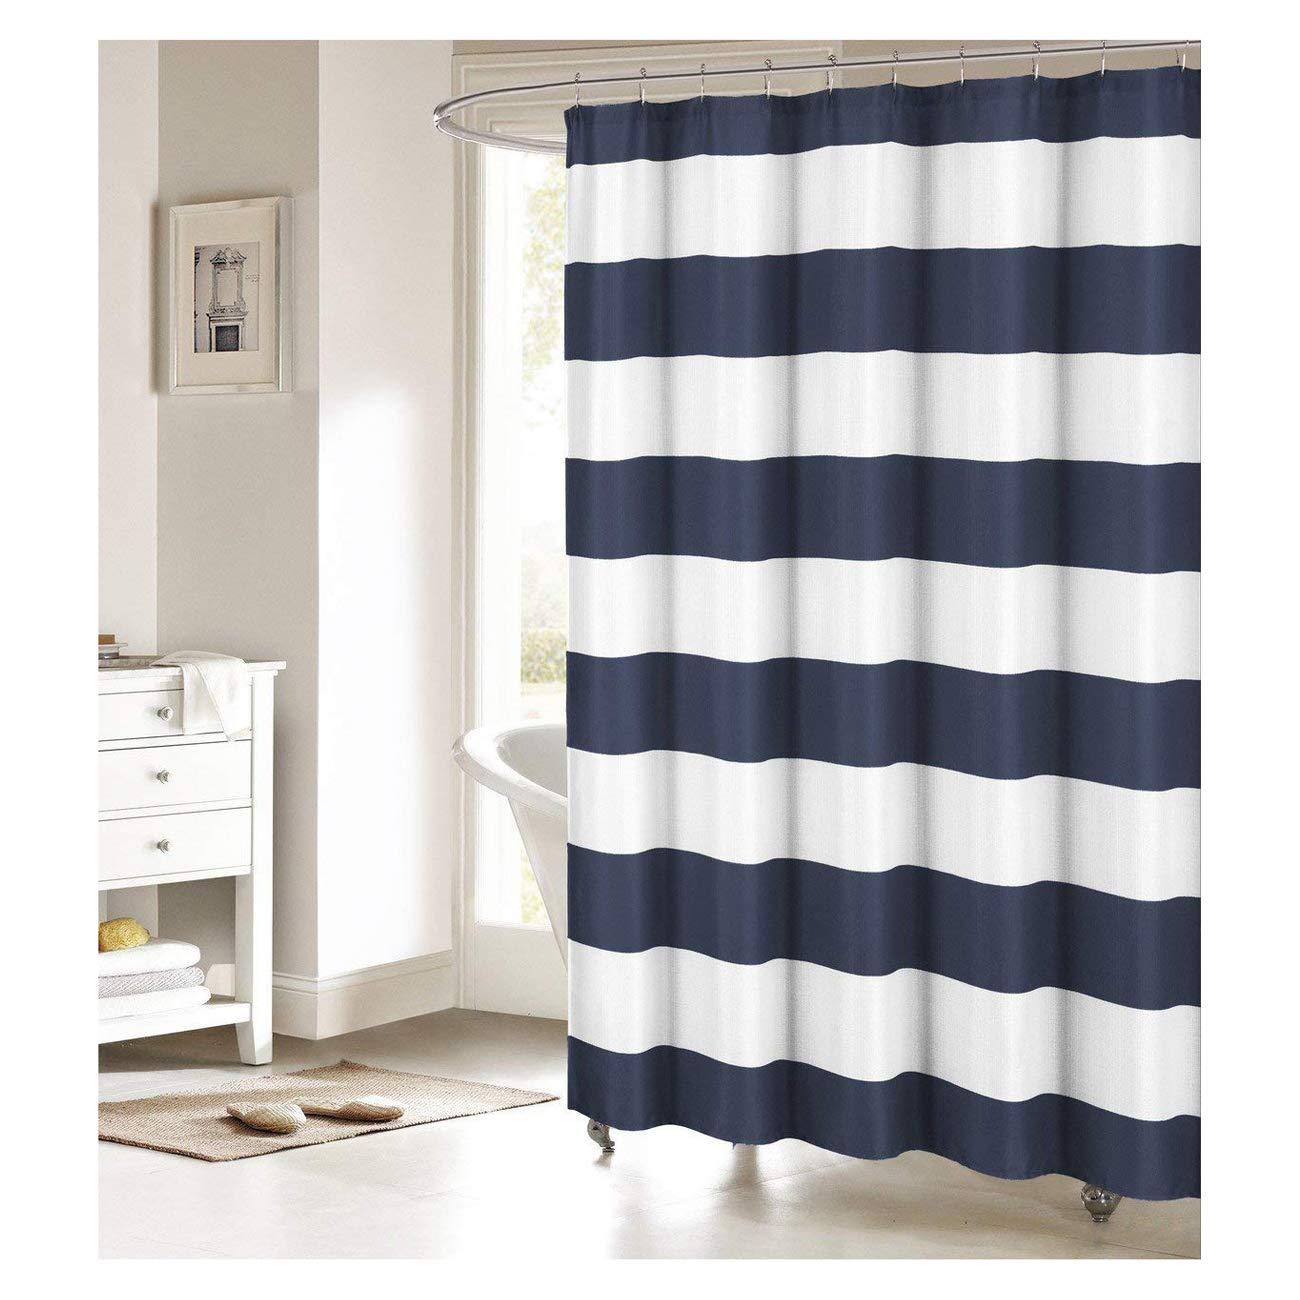 Amazon Fabric Shower Curtain Nautical Stripe Design Navy And White Home Kitchen